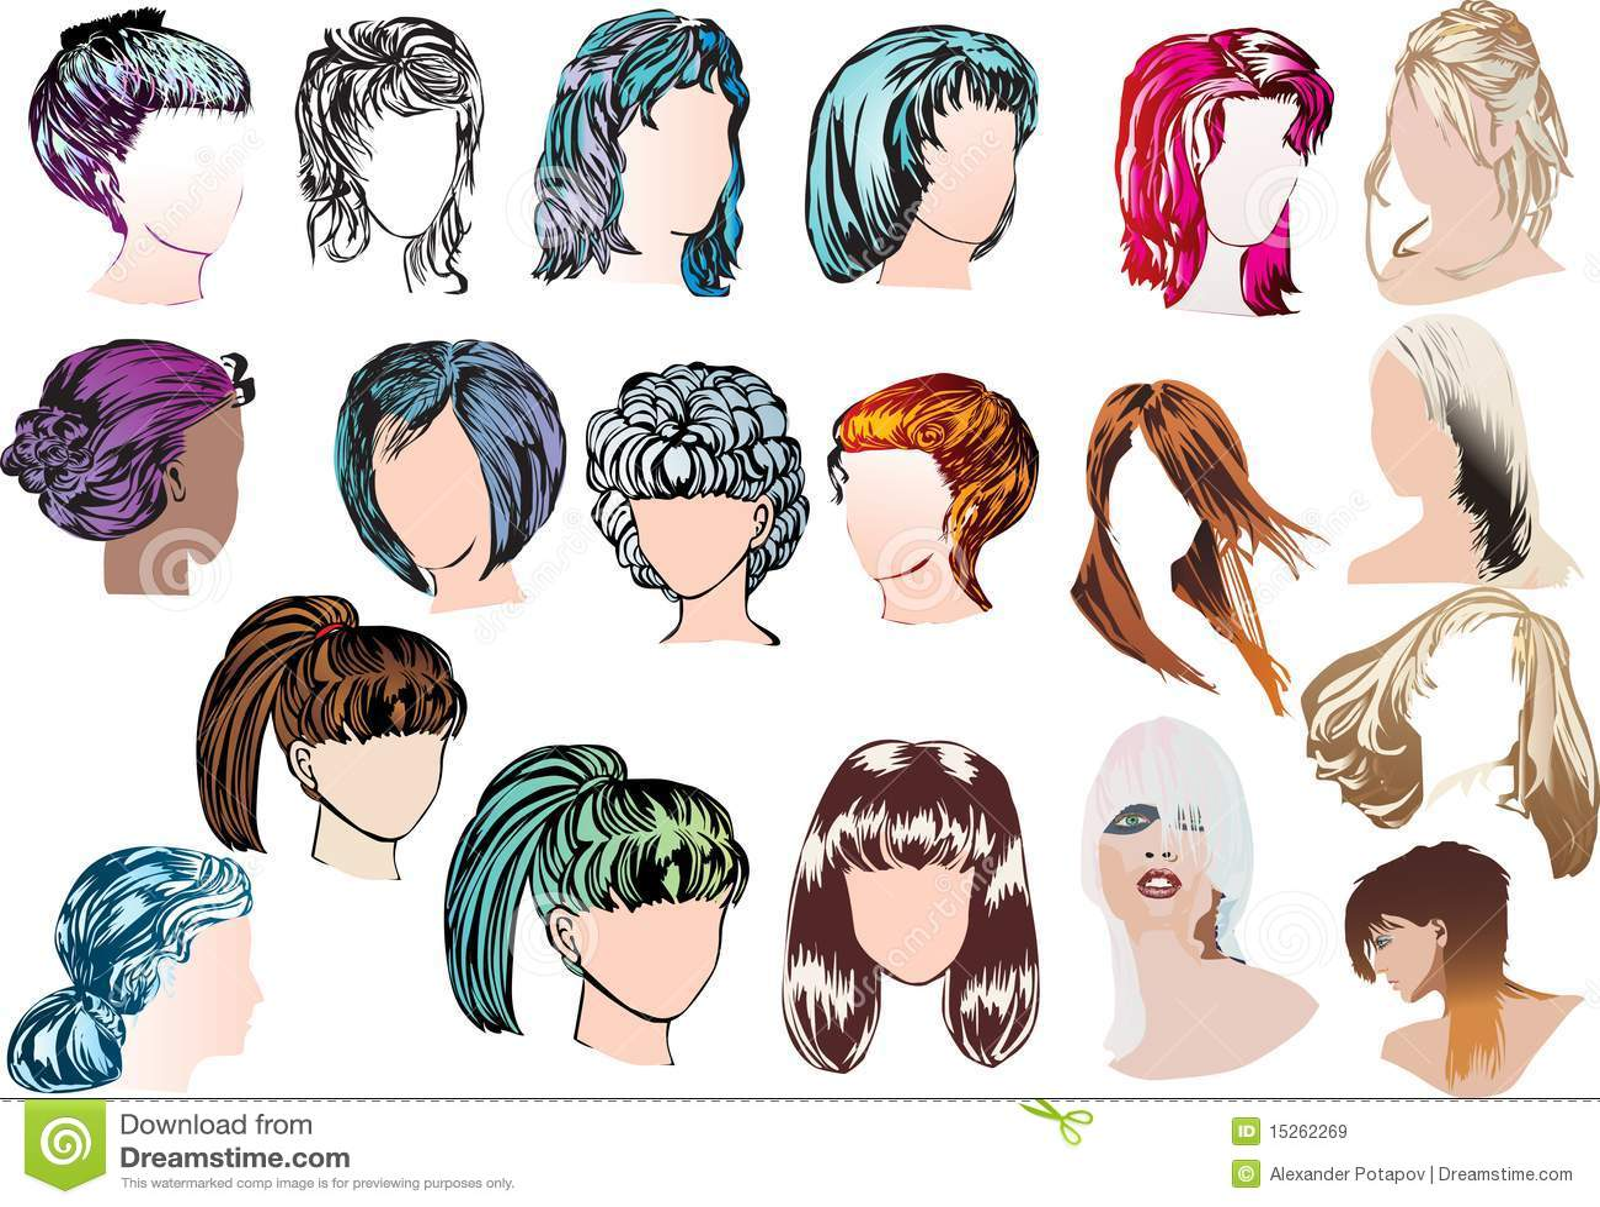 Neunzehn Moderne Frisuren Der Frau Lizenzfreie Stockbilder Bild